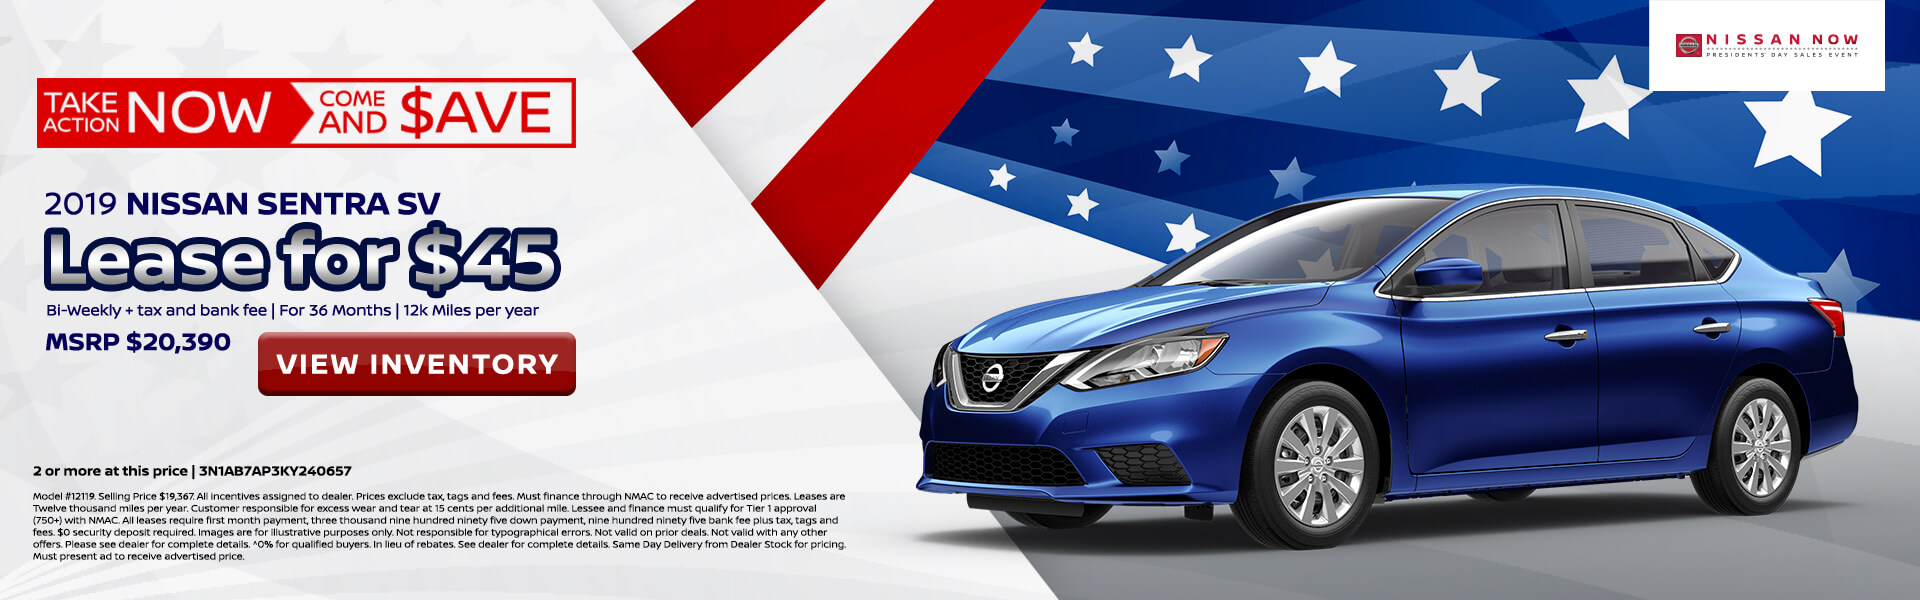 Nissan Sentra $90 Lease